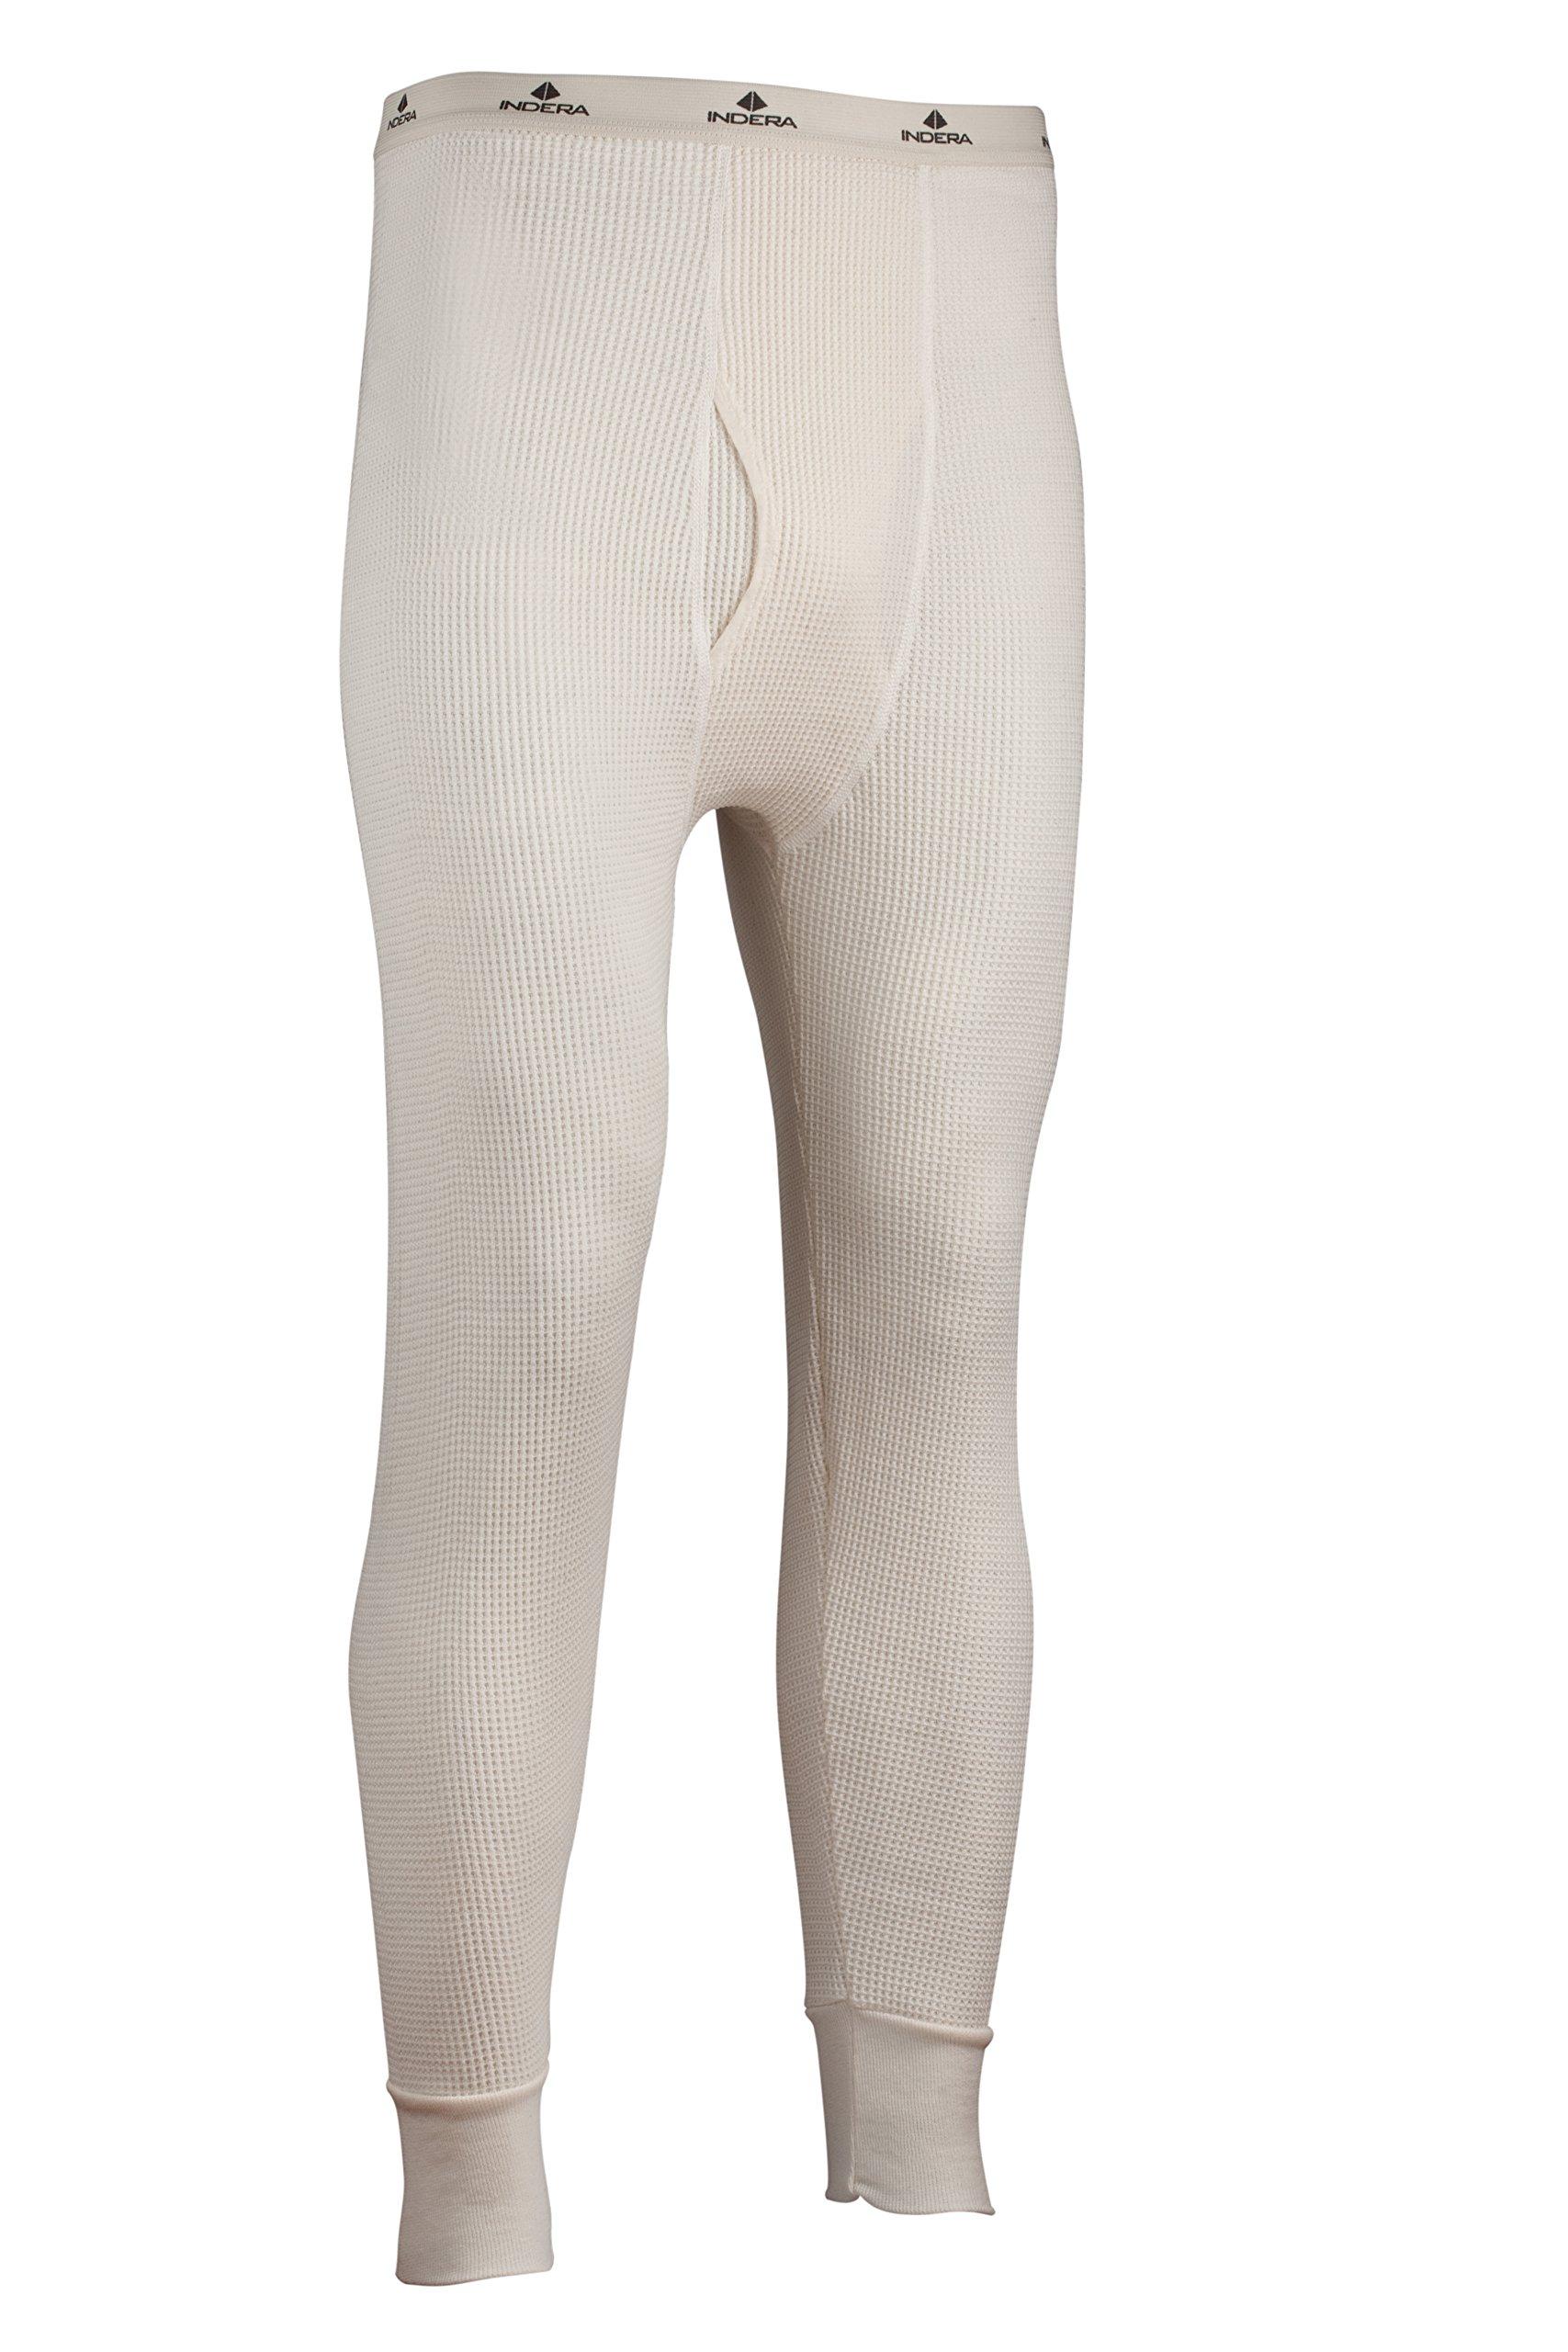 Indera Men's Maximum Weight Thermal Underwear Pant, Natural, 6X-Large by Indera